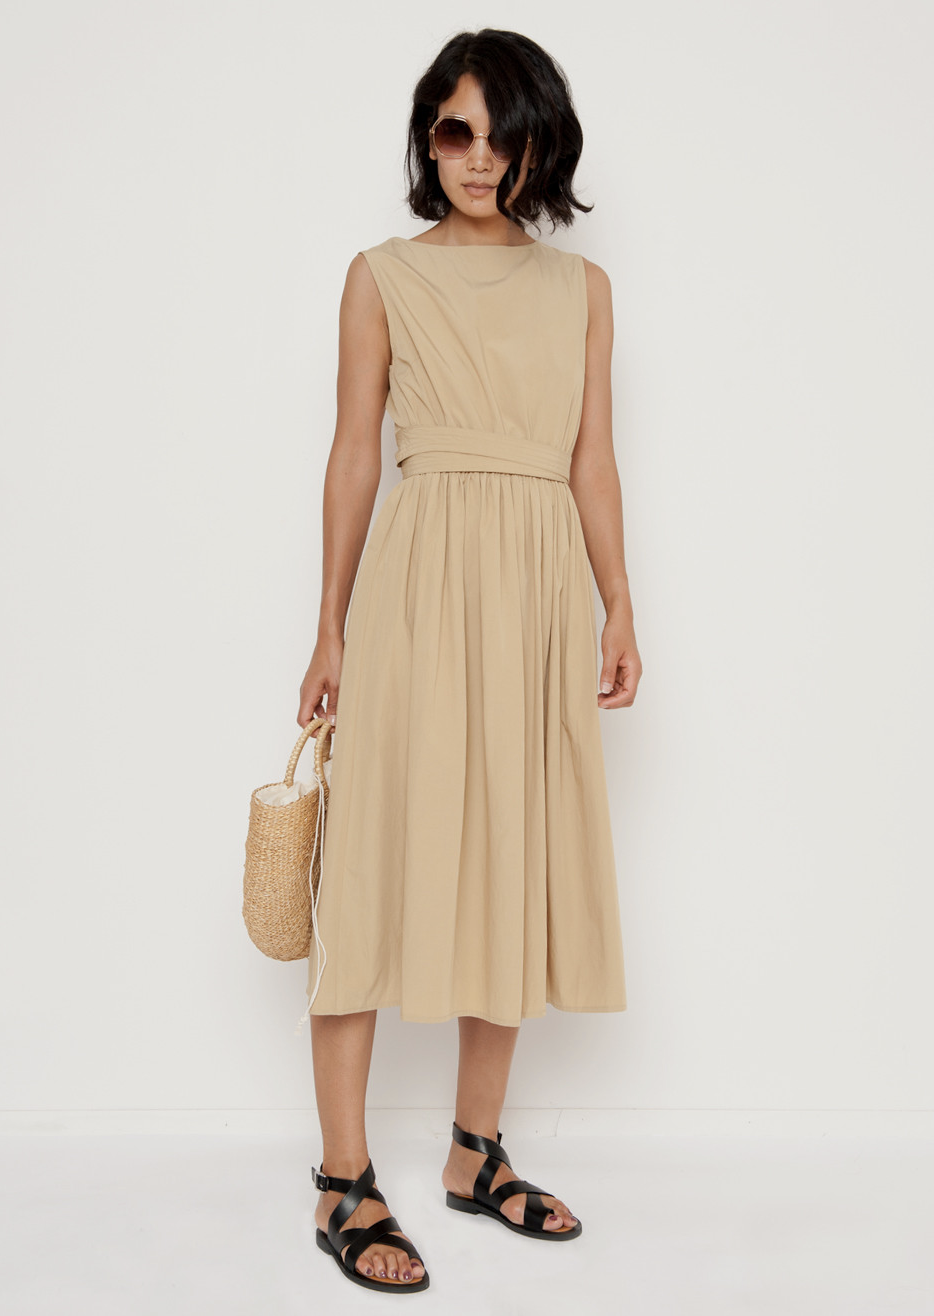 A neutral, wear everyday dress